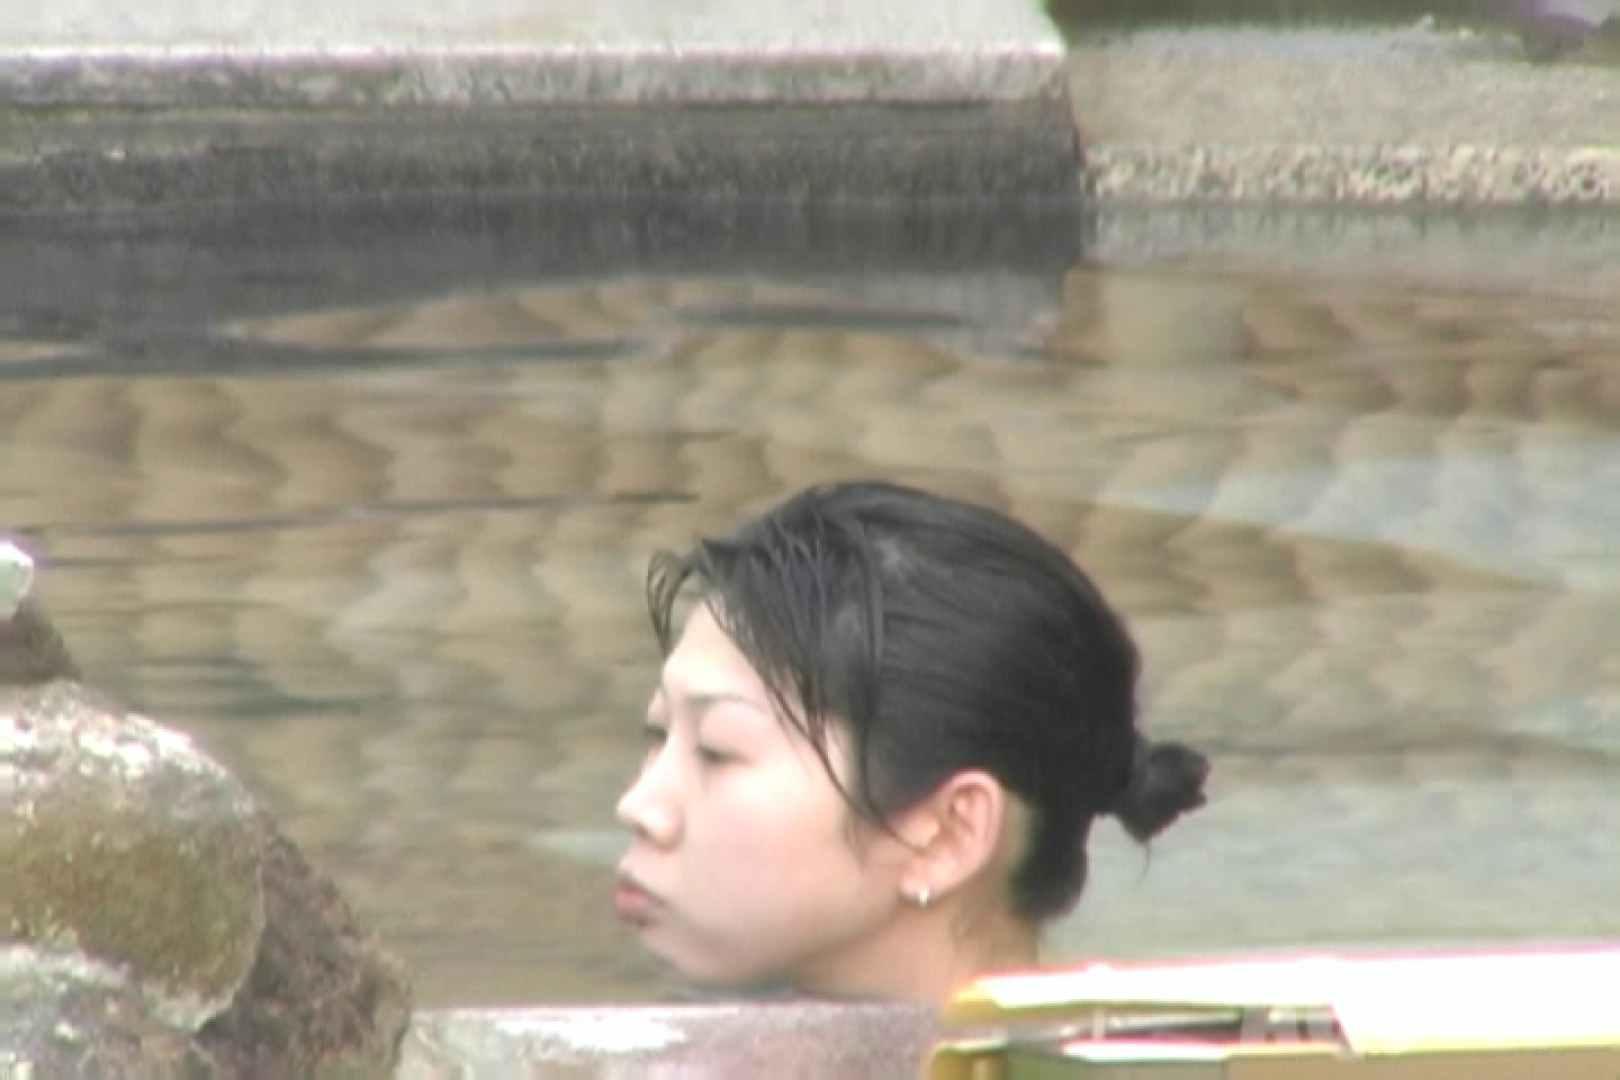 Aquaな露天風呂Vol.850 OLのエロ生活 | 露天風呂  76連発 55